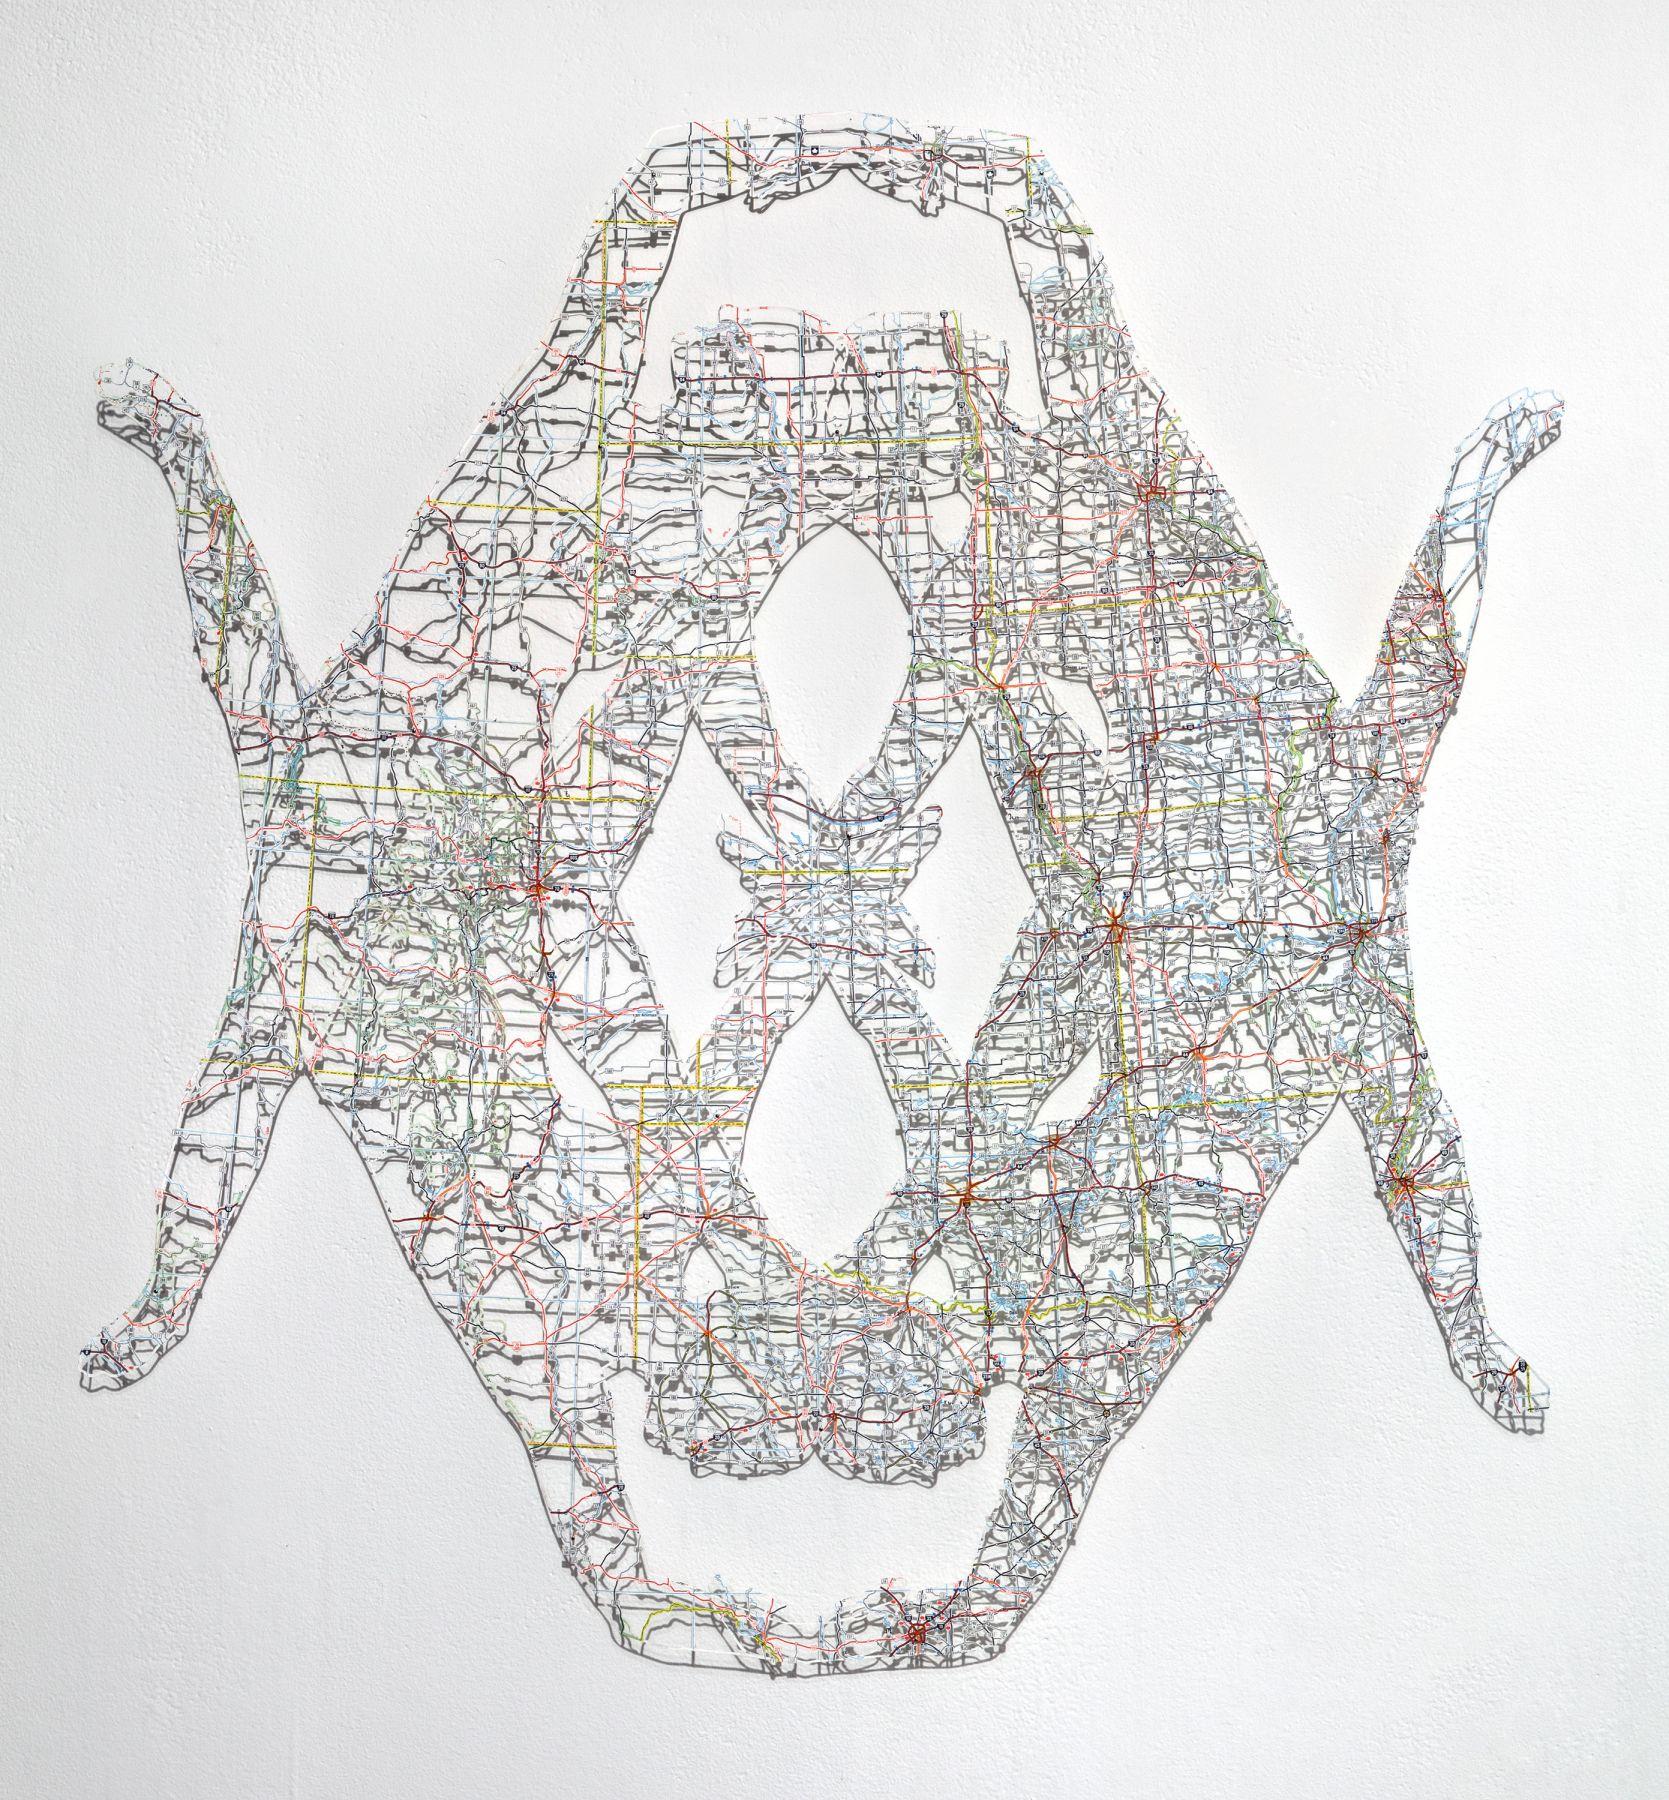 NIKKI ROSATO Untitled (Object) X, 2017